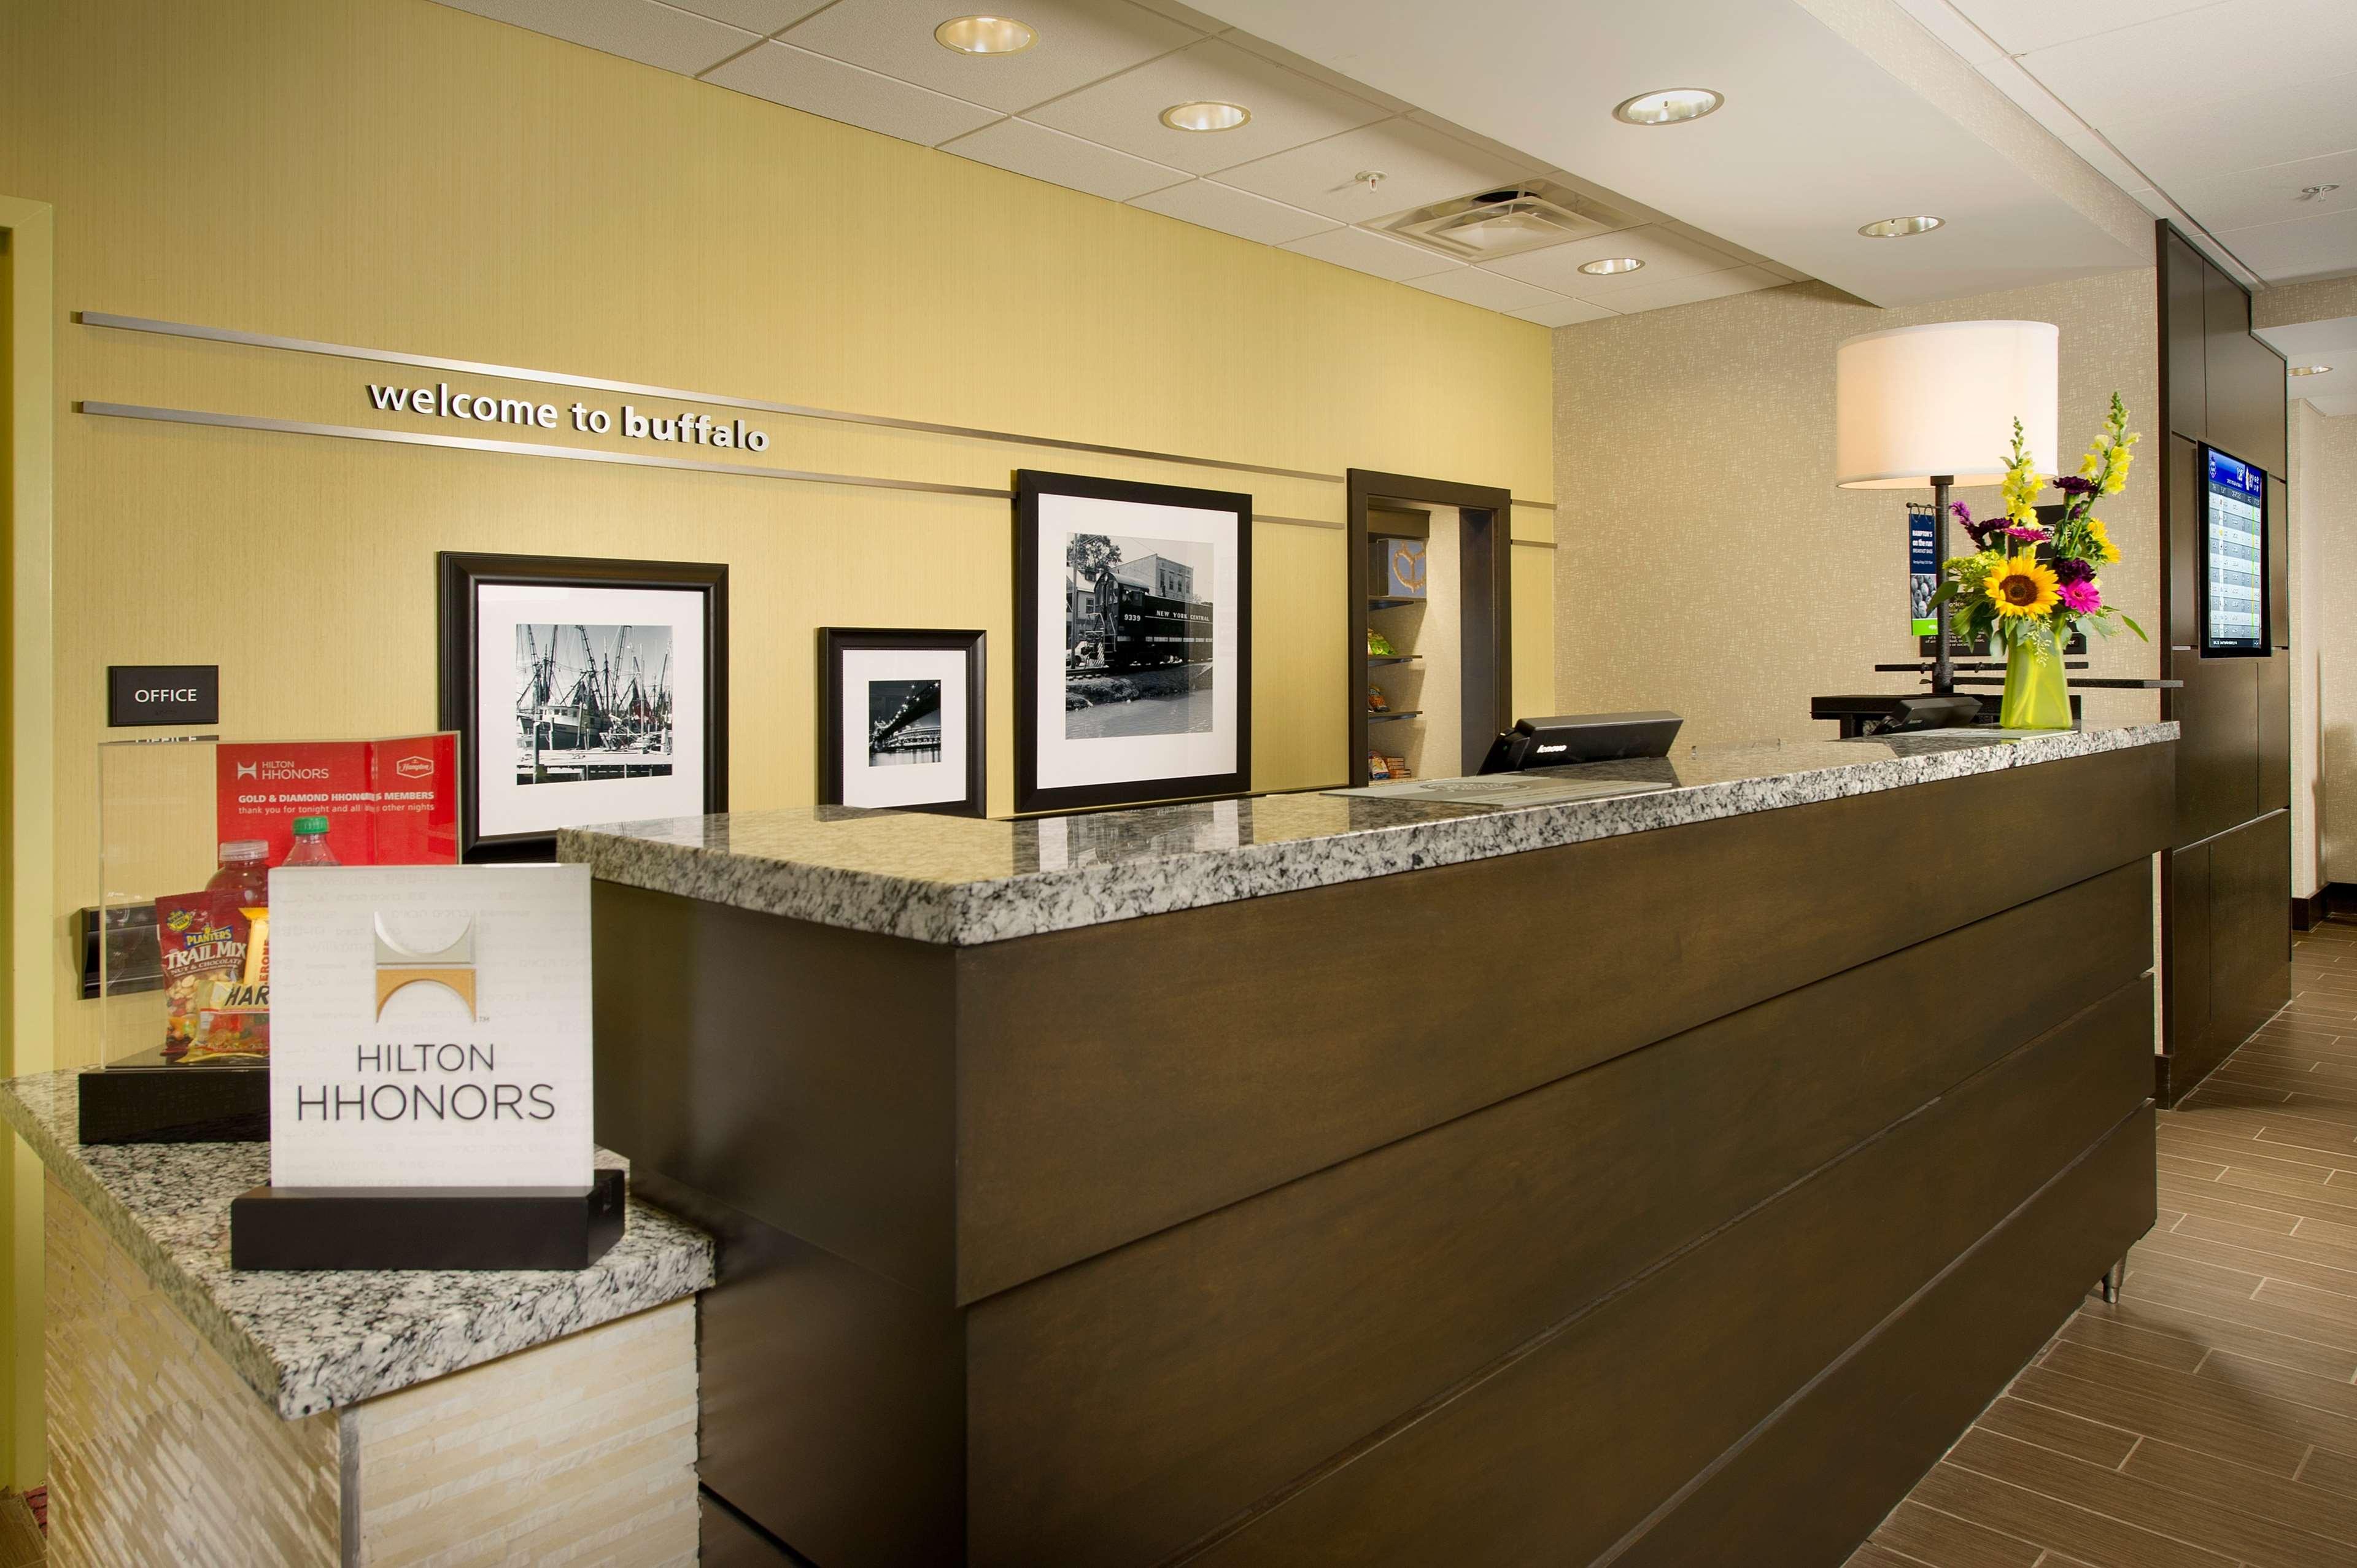 Hampton Inn & Suites Buffalo Airport image 4